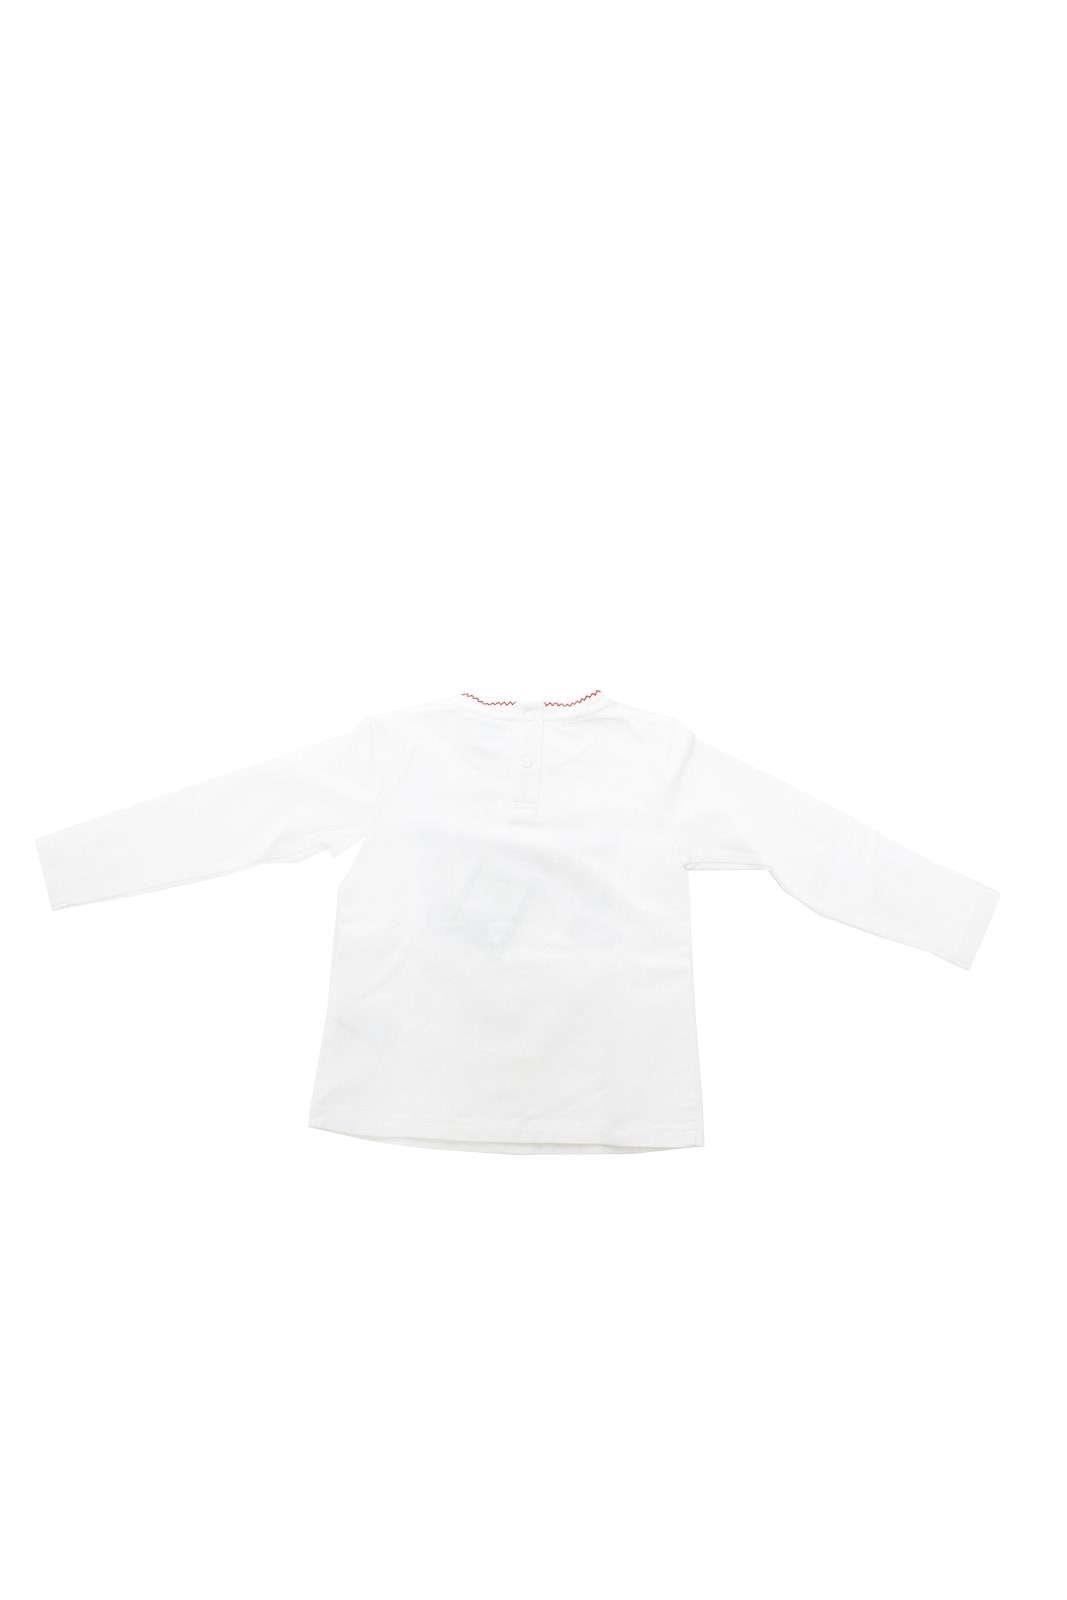 https://www.parmax.com/media/catalog/product/a/i/PE-outlet_parmax-maglia-bambina-Silvian-Heach-NNDI5051TS-B.jpg